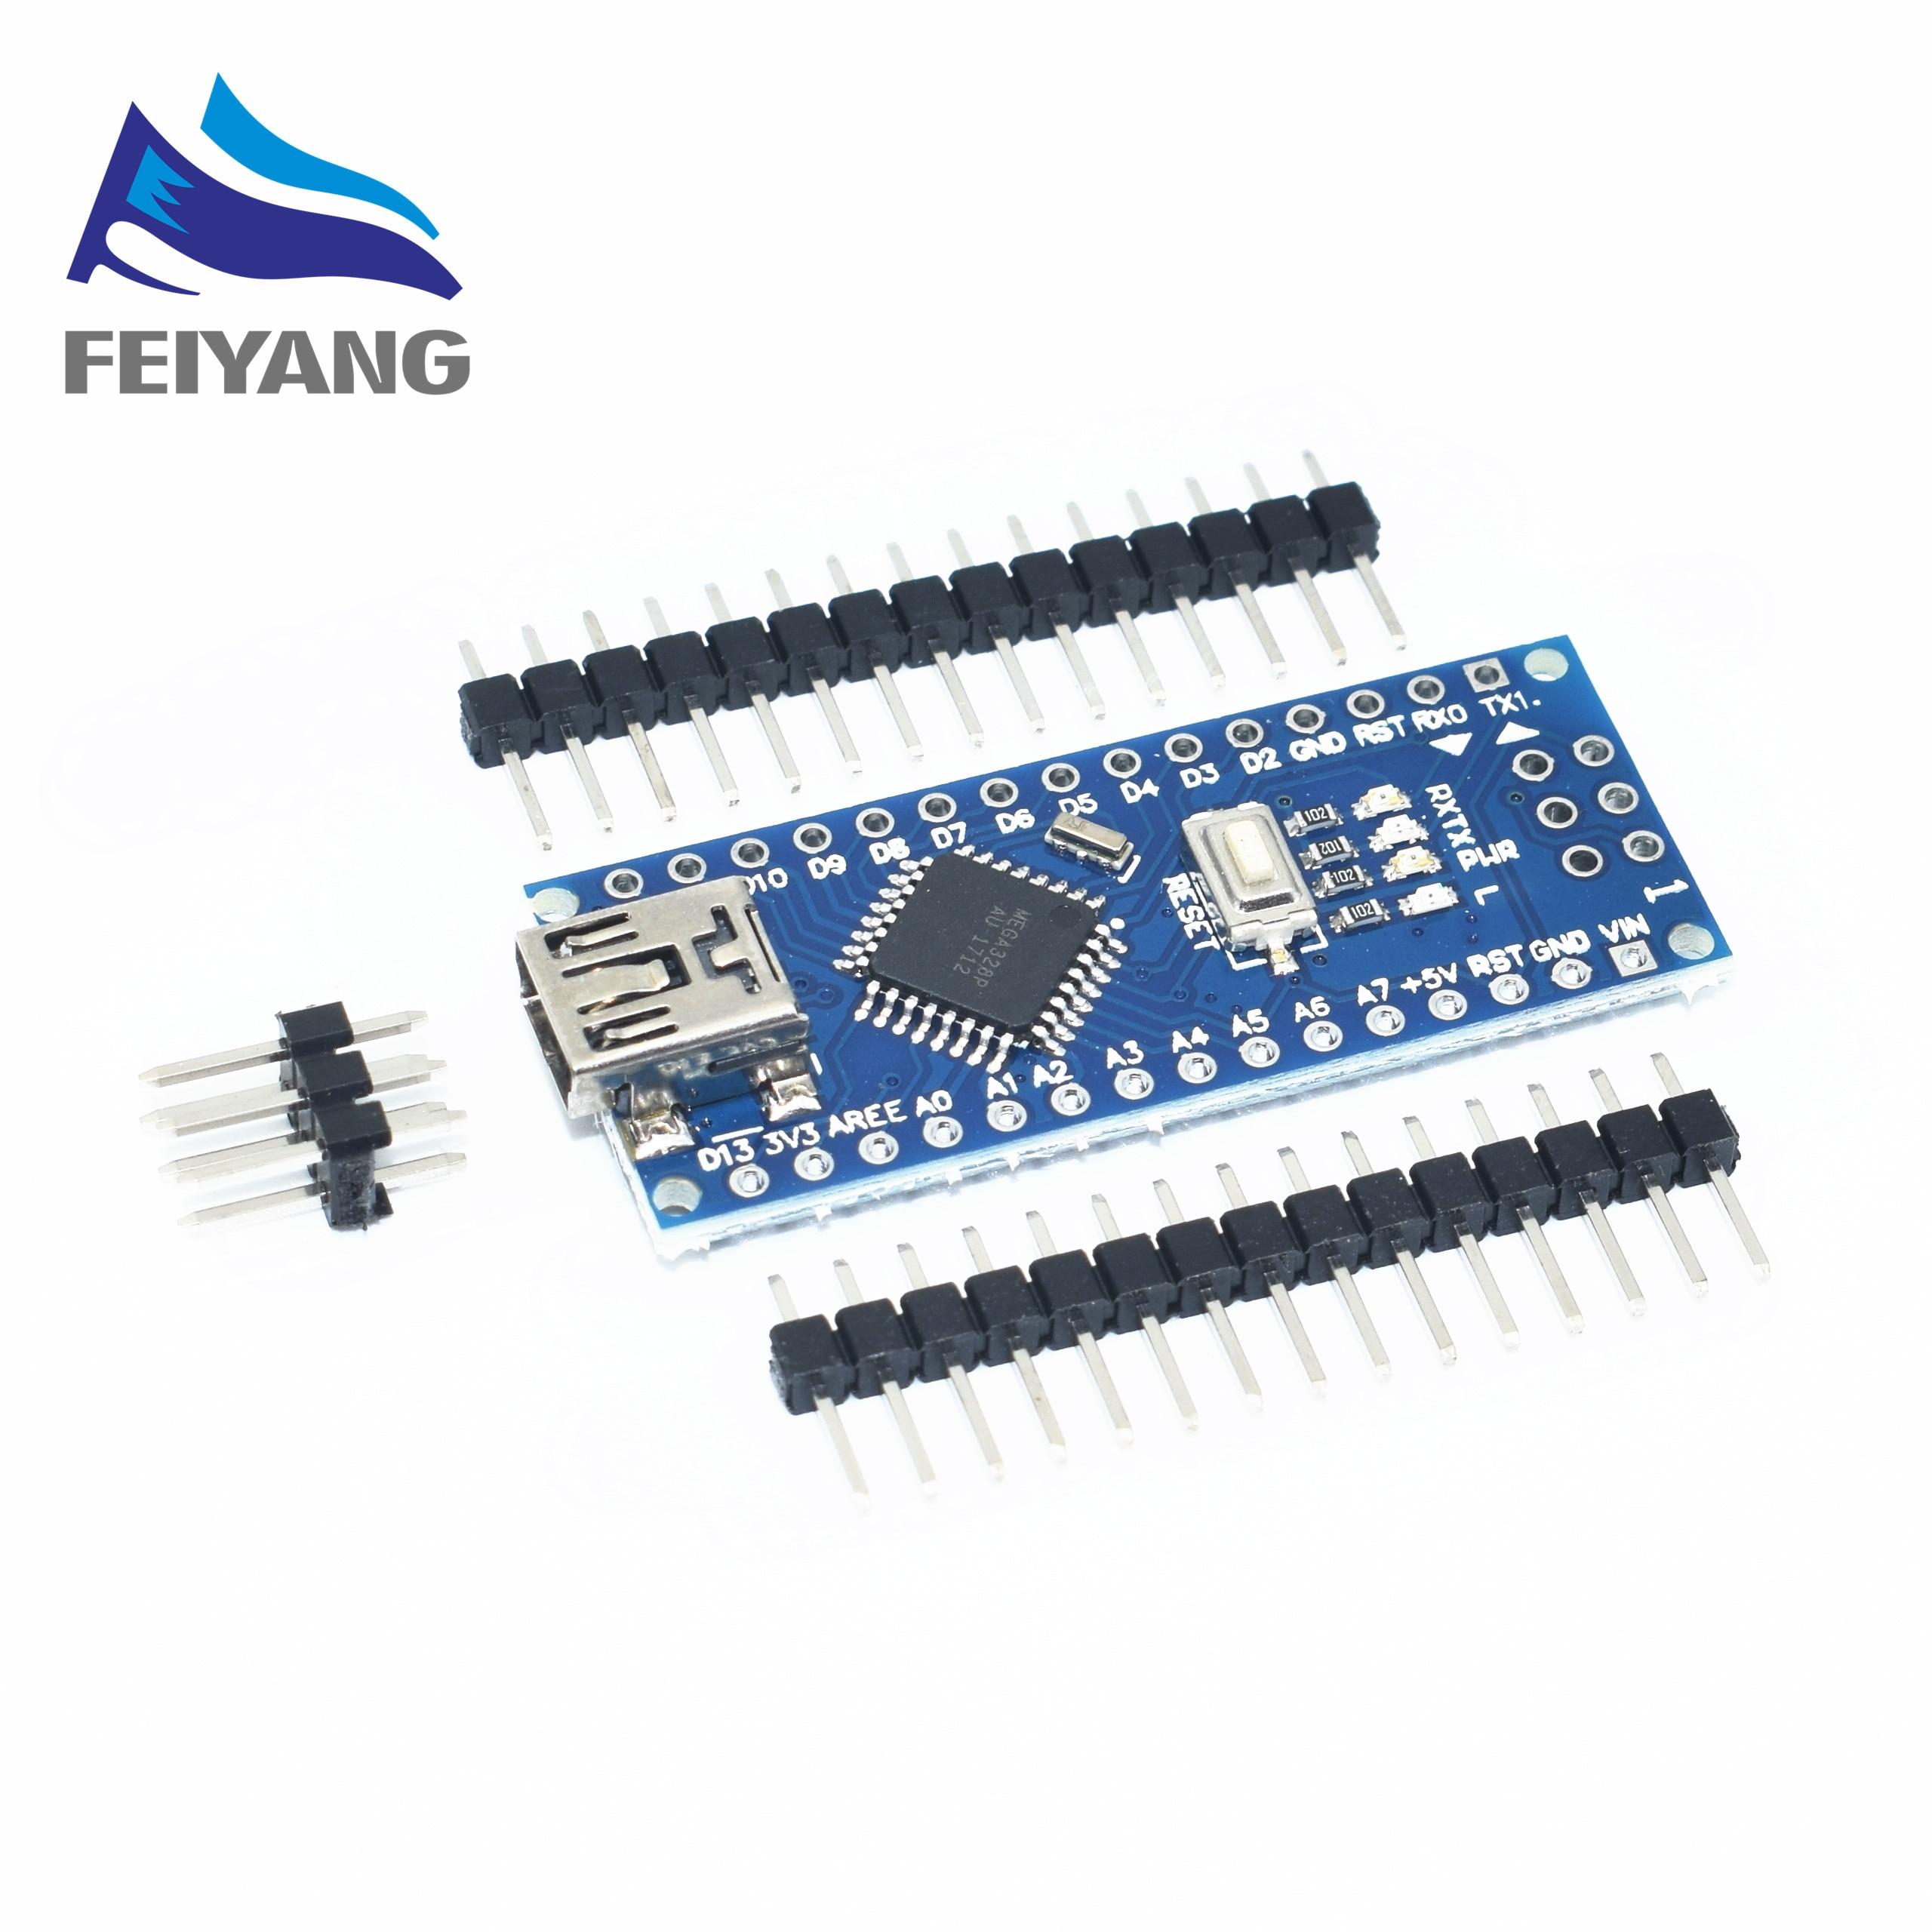 Nano Mini-USB С загрузчика совместимый для arduino Nano 3,0 контроллер CH340 драйвер USB 16 мГц Nano v3.0 ATMEGA328P